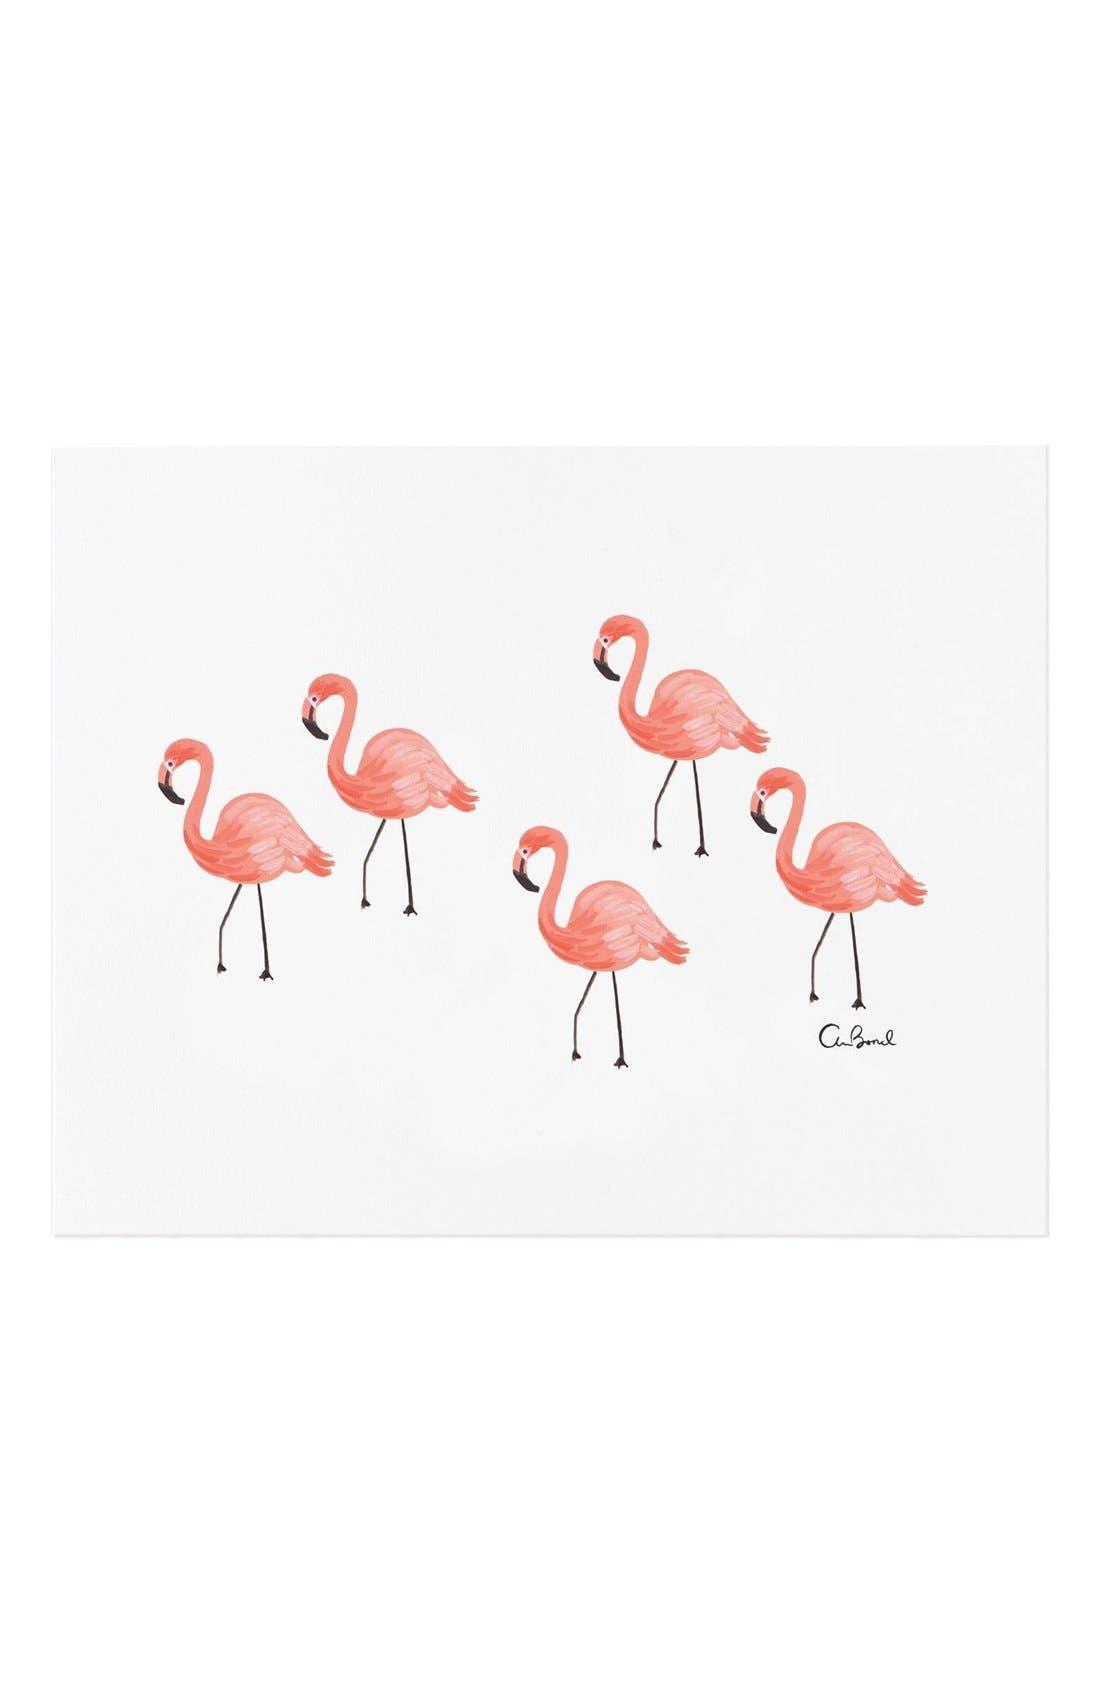 Alternate Image 1 Selected - Rifle Paper Co. 'Flamingo' Art Print